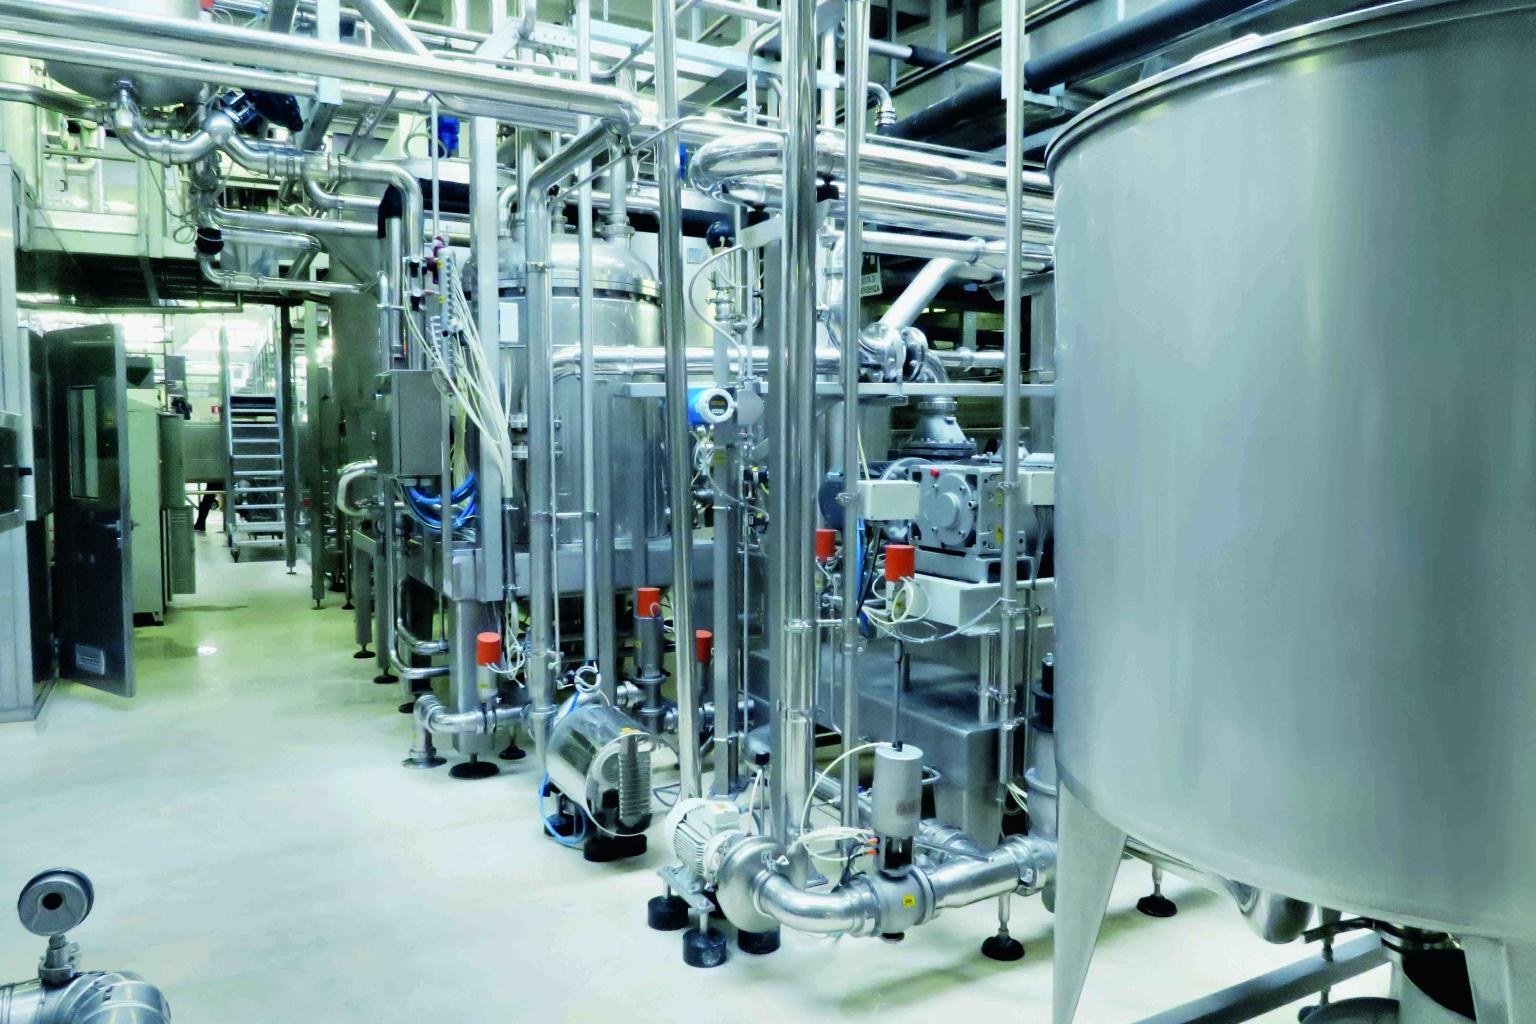 Endress+Hauser technology is enabling better plant management